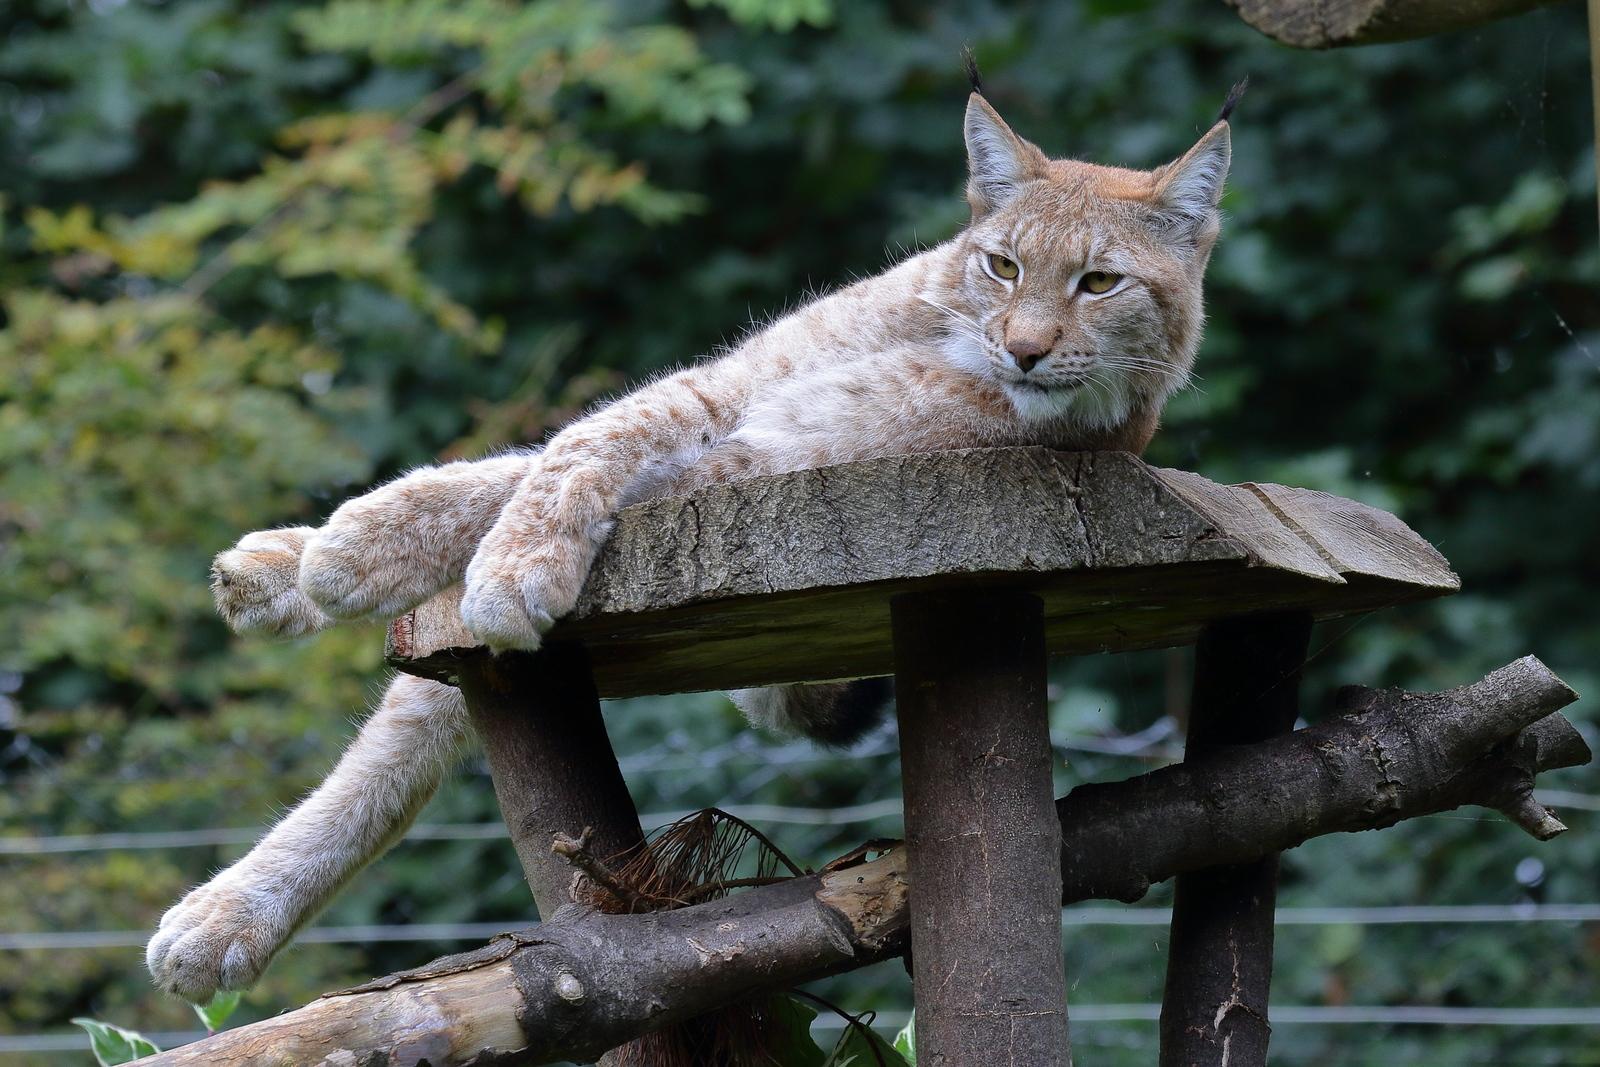 IMAGE: https://photos.smugmug.com/Earths-Other-Residents/Big-Cats/i-mXbRjwW/0/94460f50/X3/00022337-X3.jpg